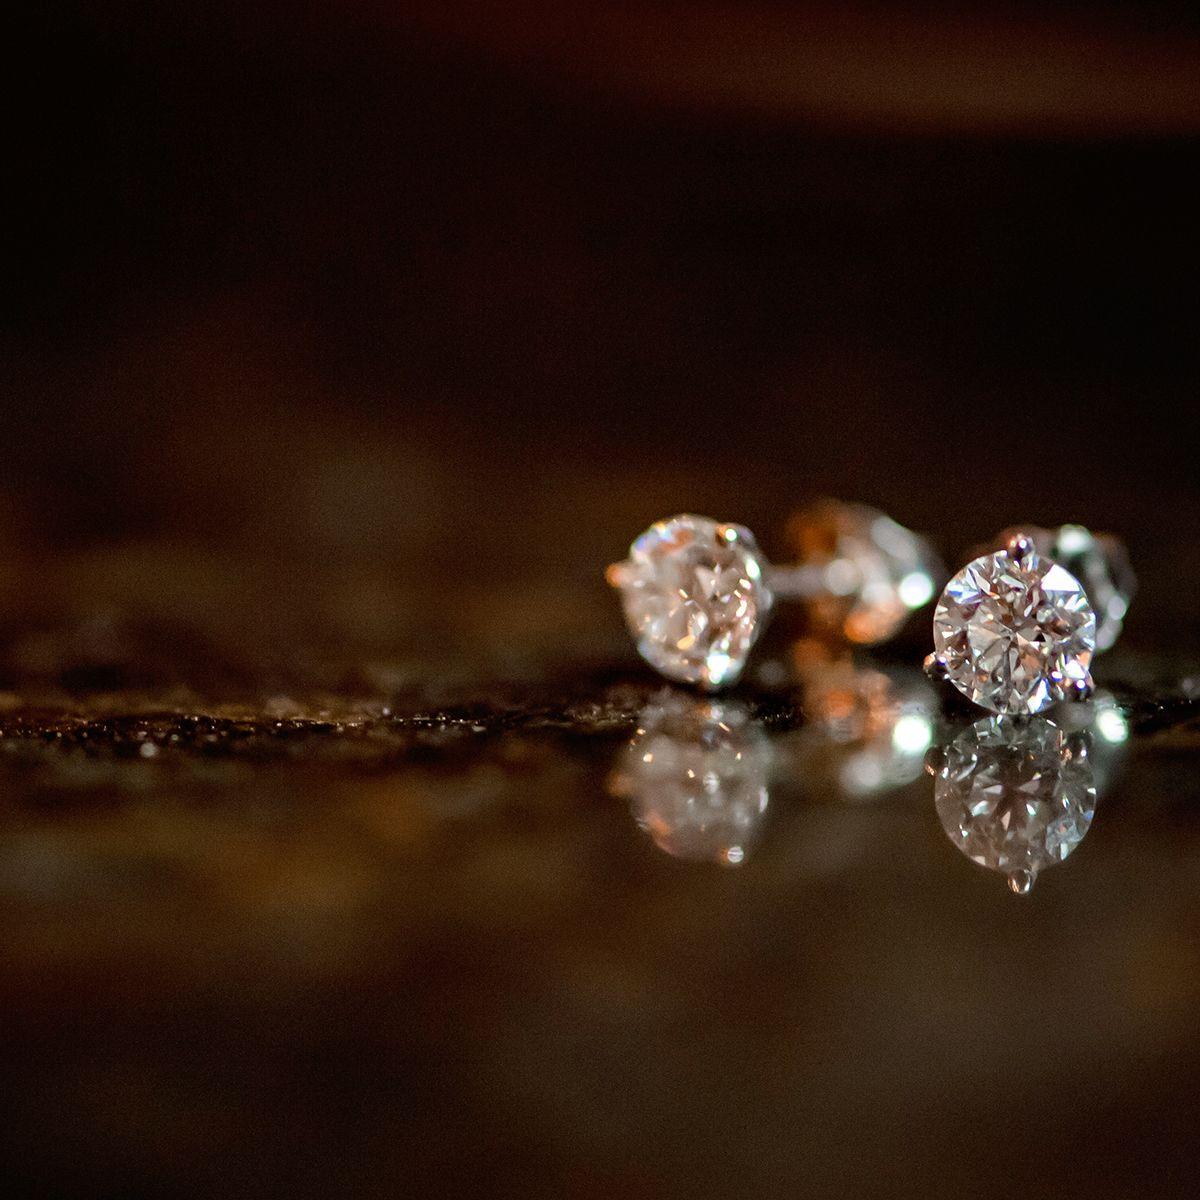 d33e5f8e4 Sparkling diamond studs belong in every jewelry lover's wardrobe. #ShaneCo